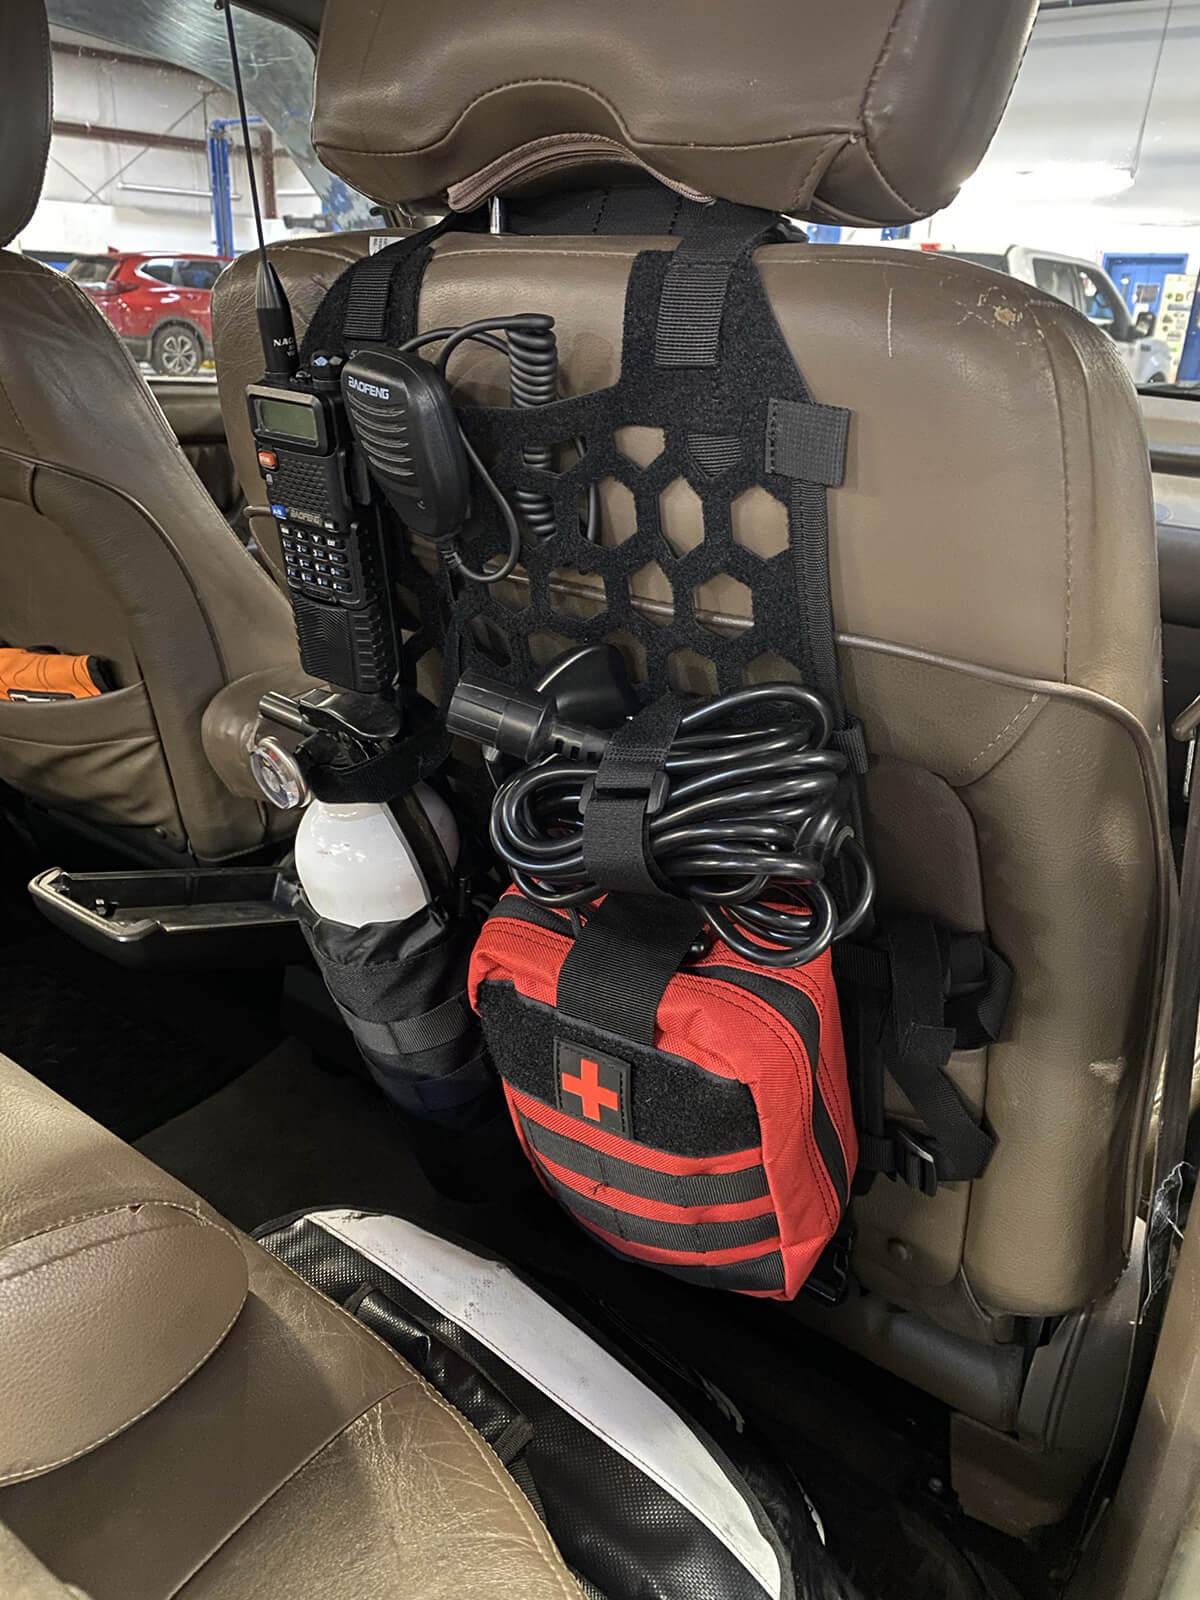 5.11 tactical hexgrid seat storage and Midland MXT 115 radio